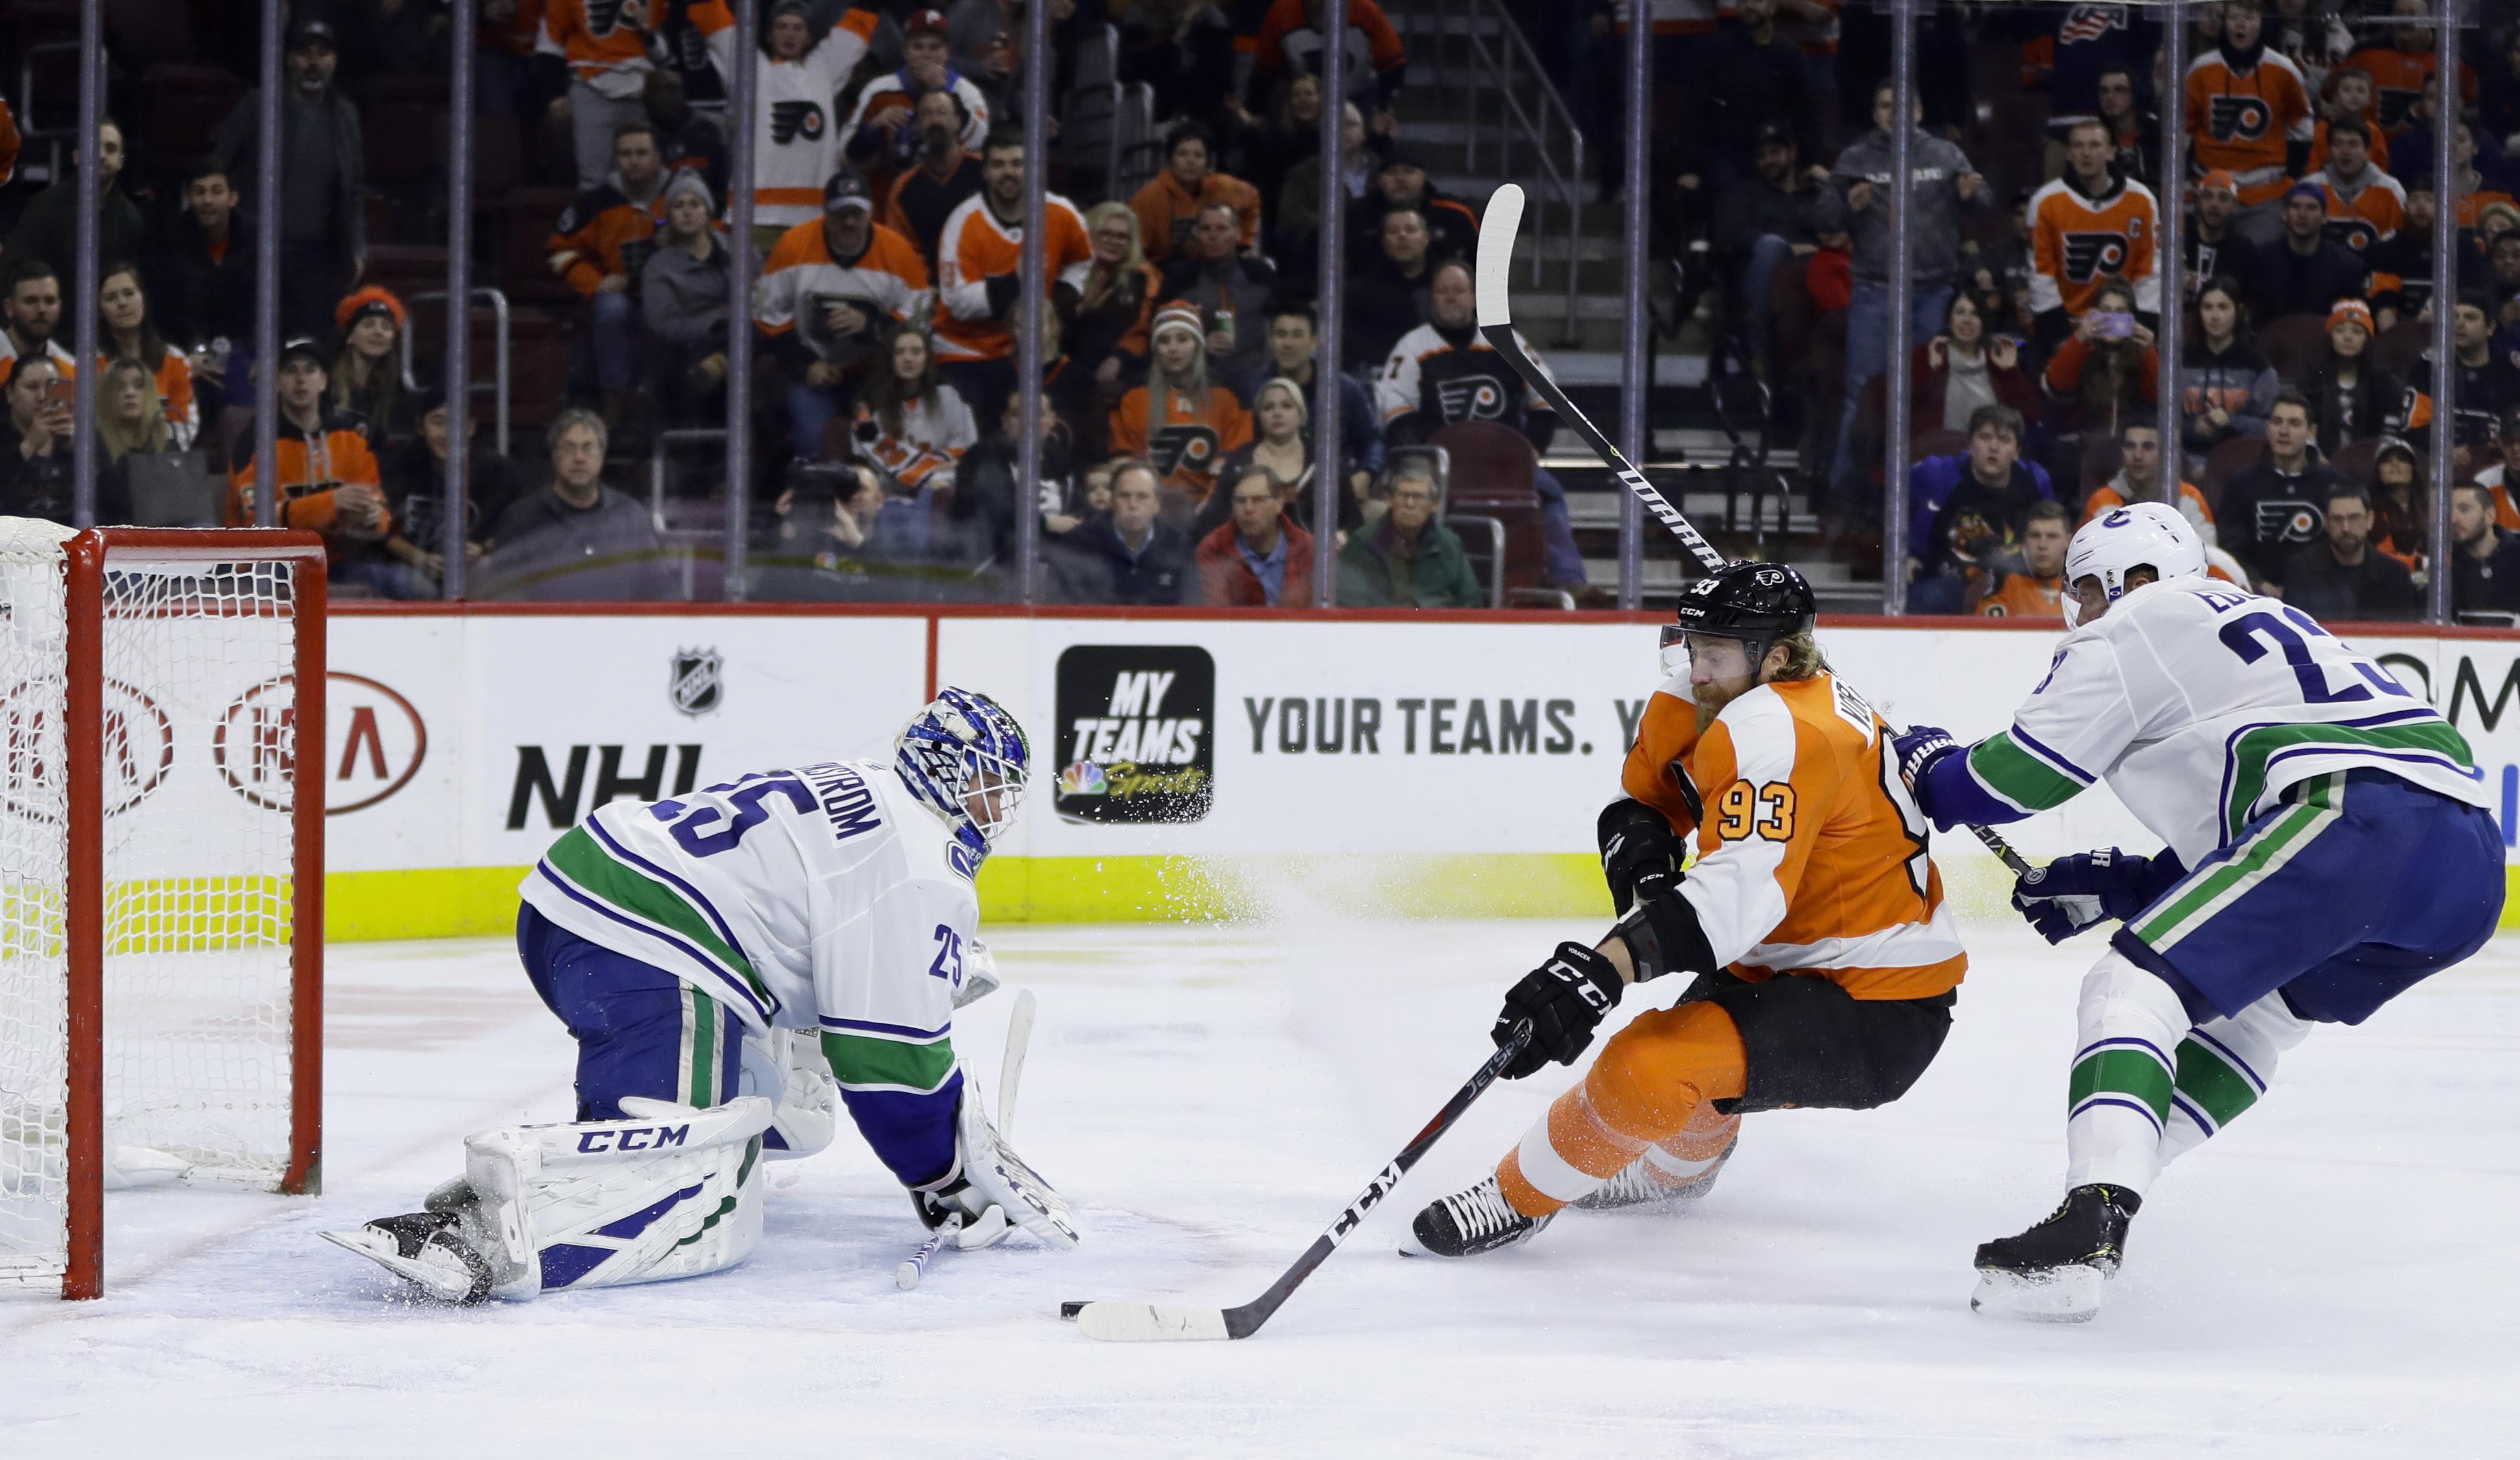 Hart, Voracek lead Flyers past Canucks for 8th straight win